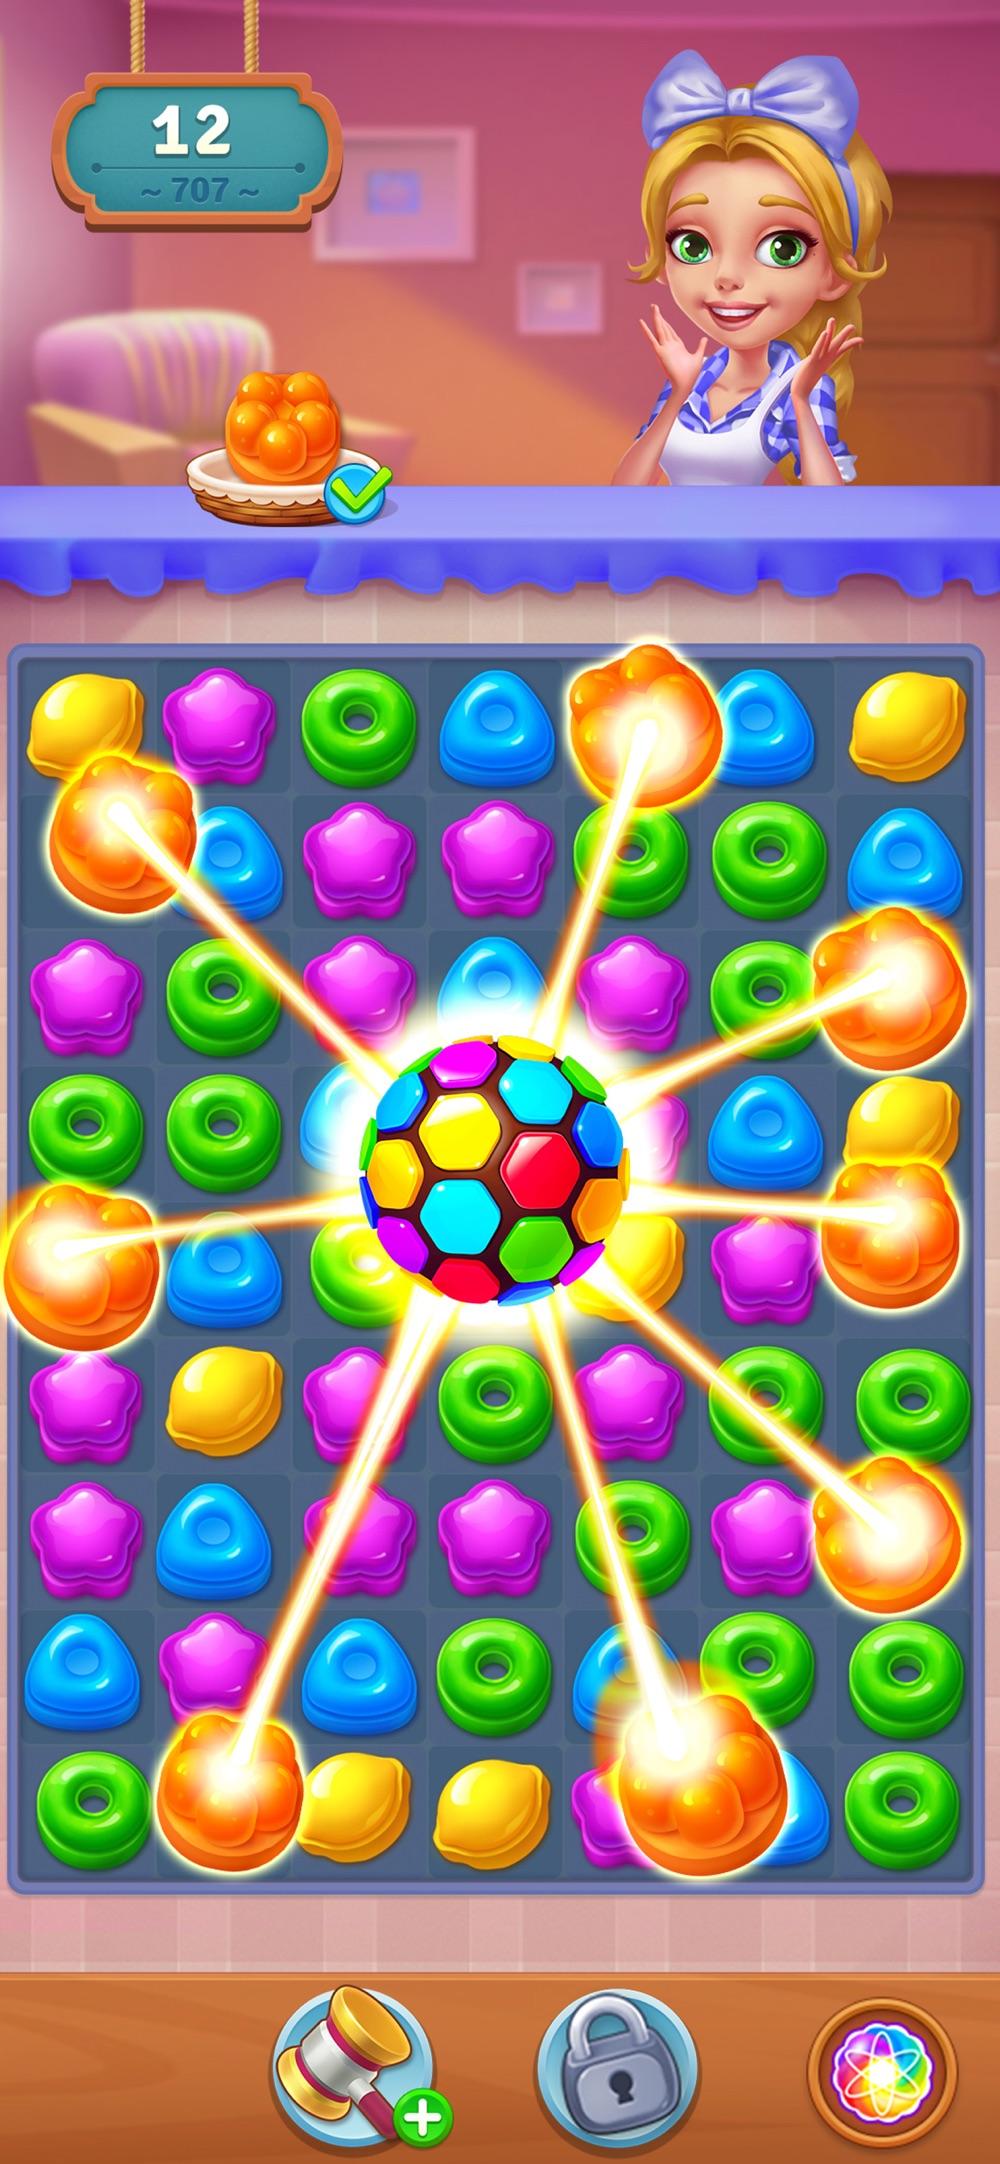 Candy Smash Mania - Match 3 hack tool